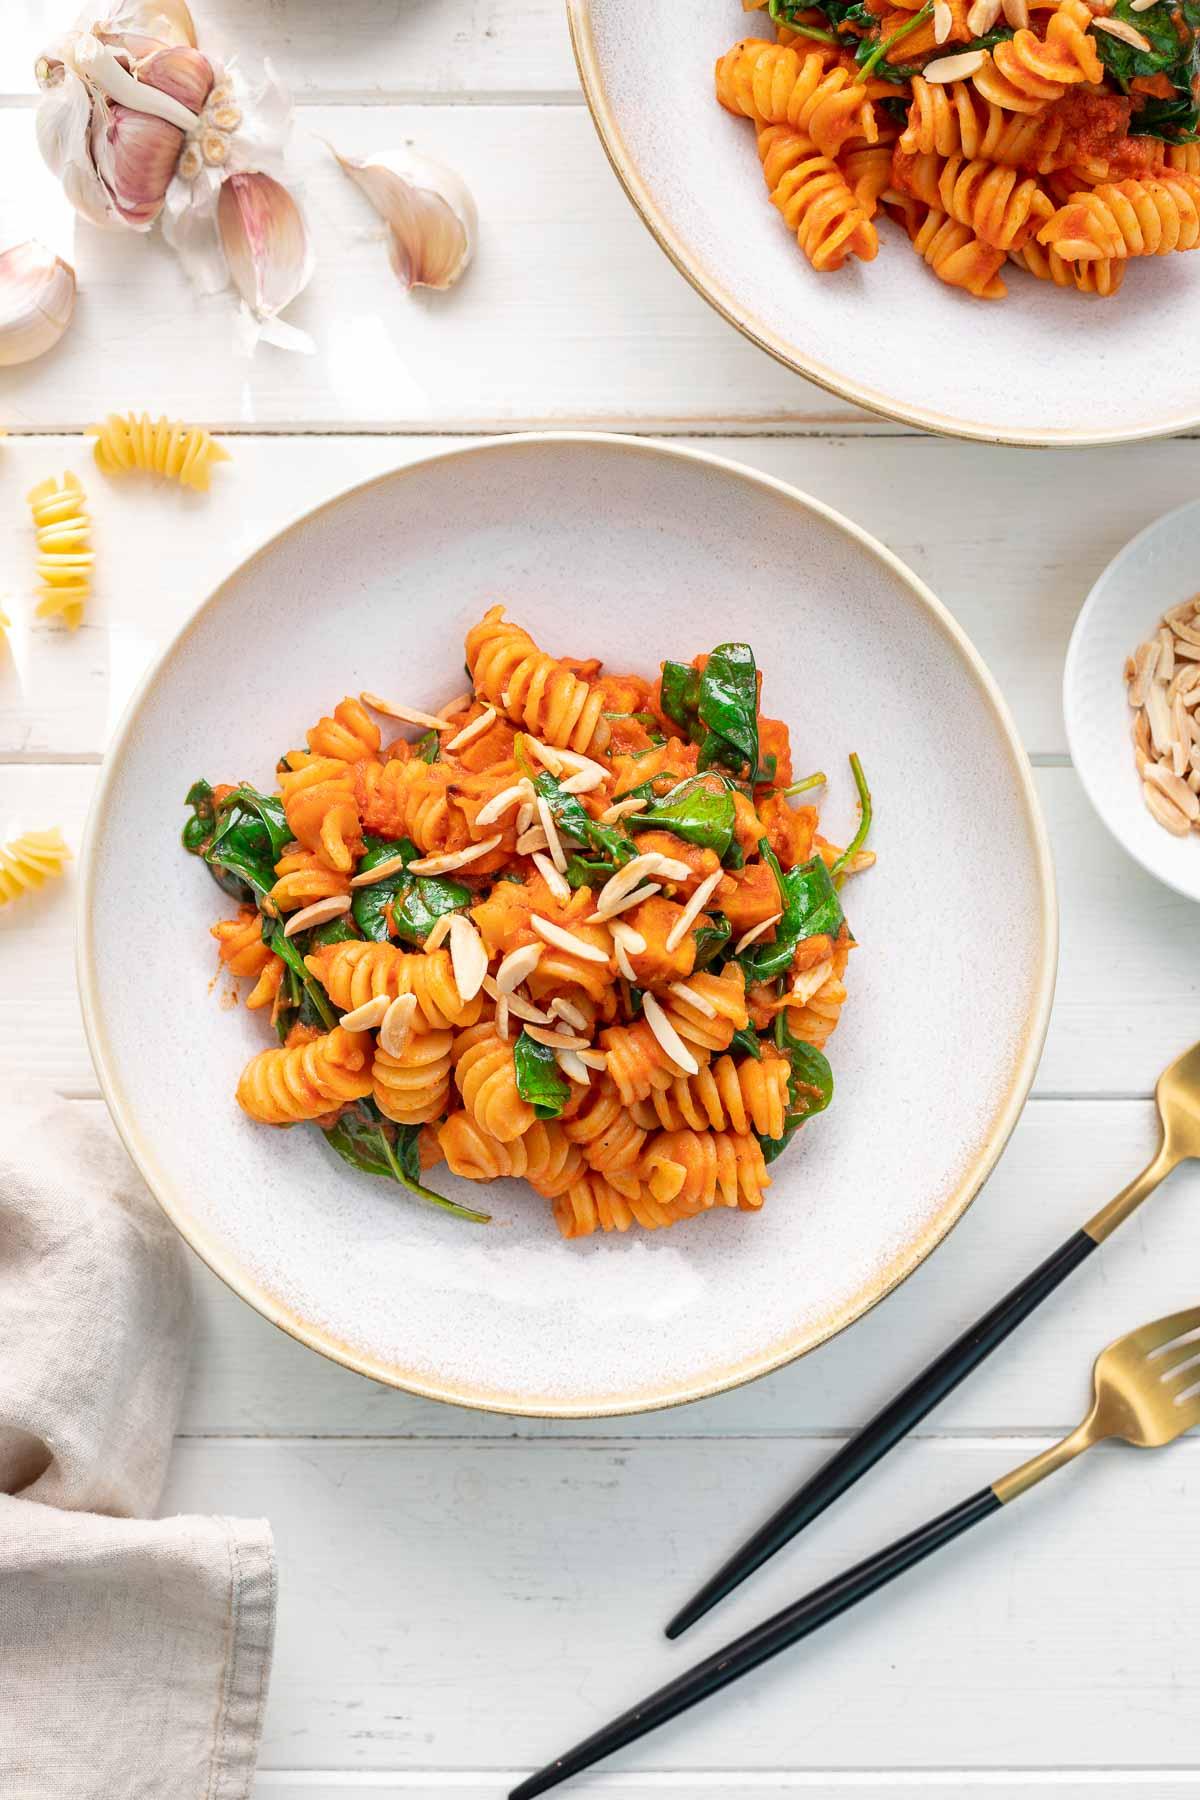 Scharfe Tomatensauce für Pasta (Arrabbiata) Rezept